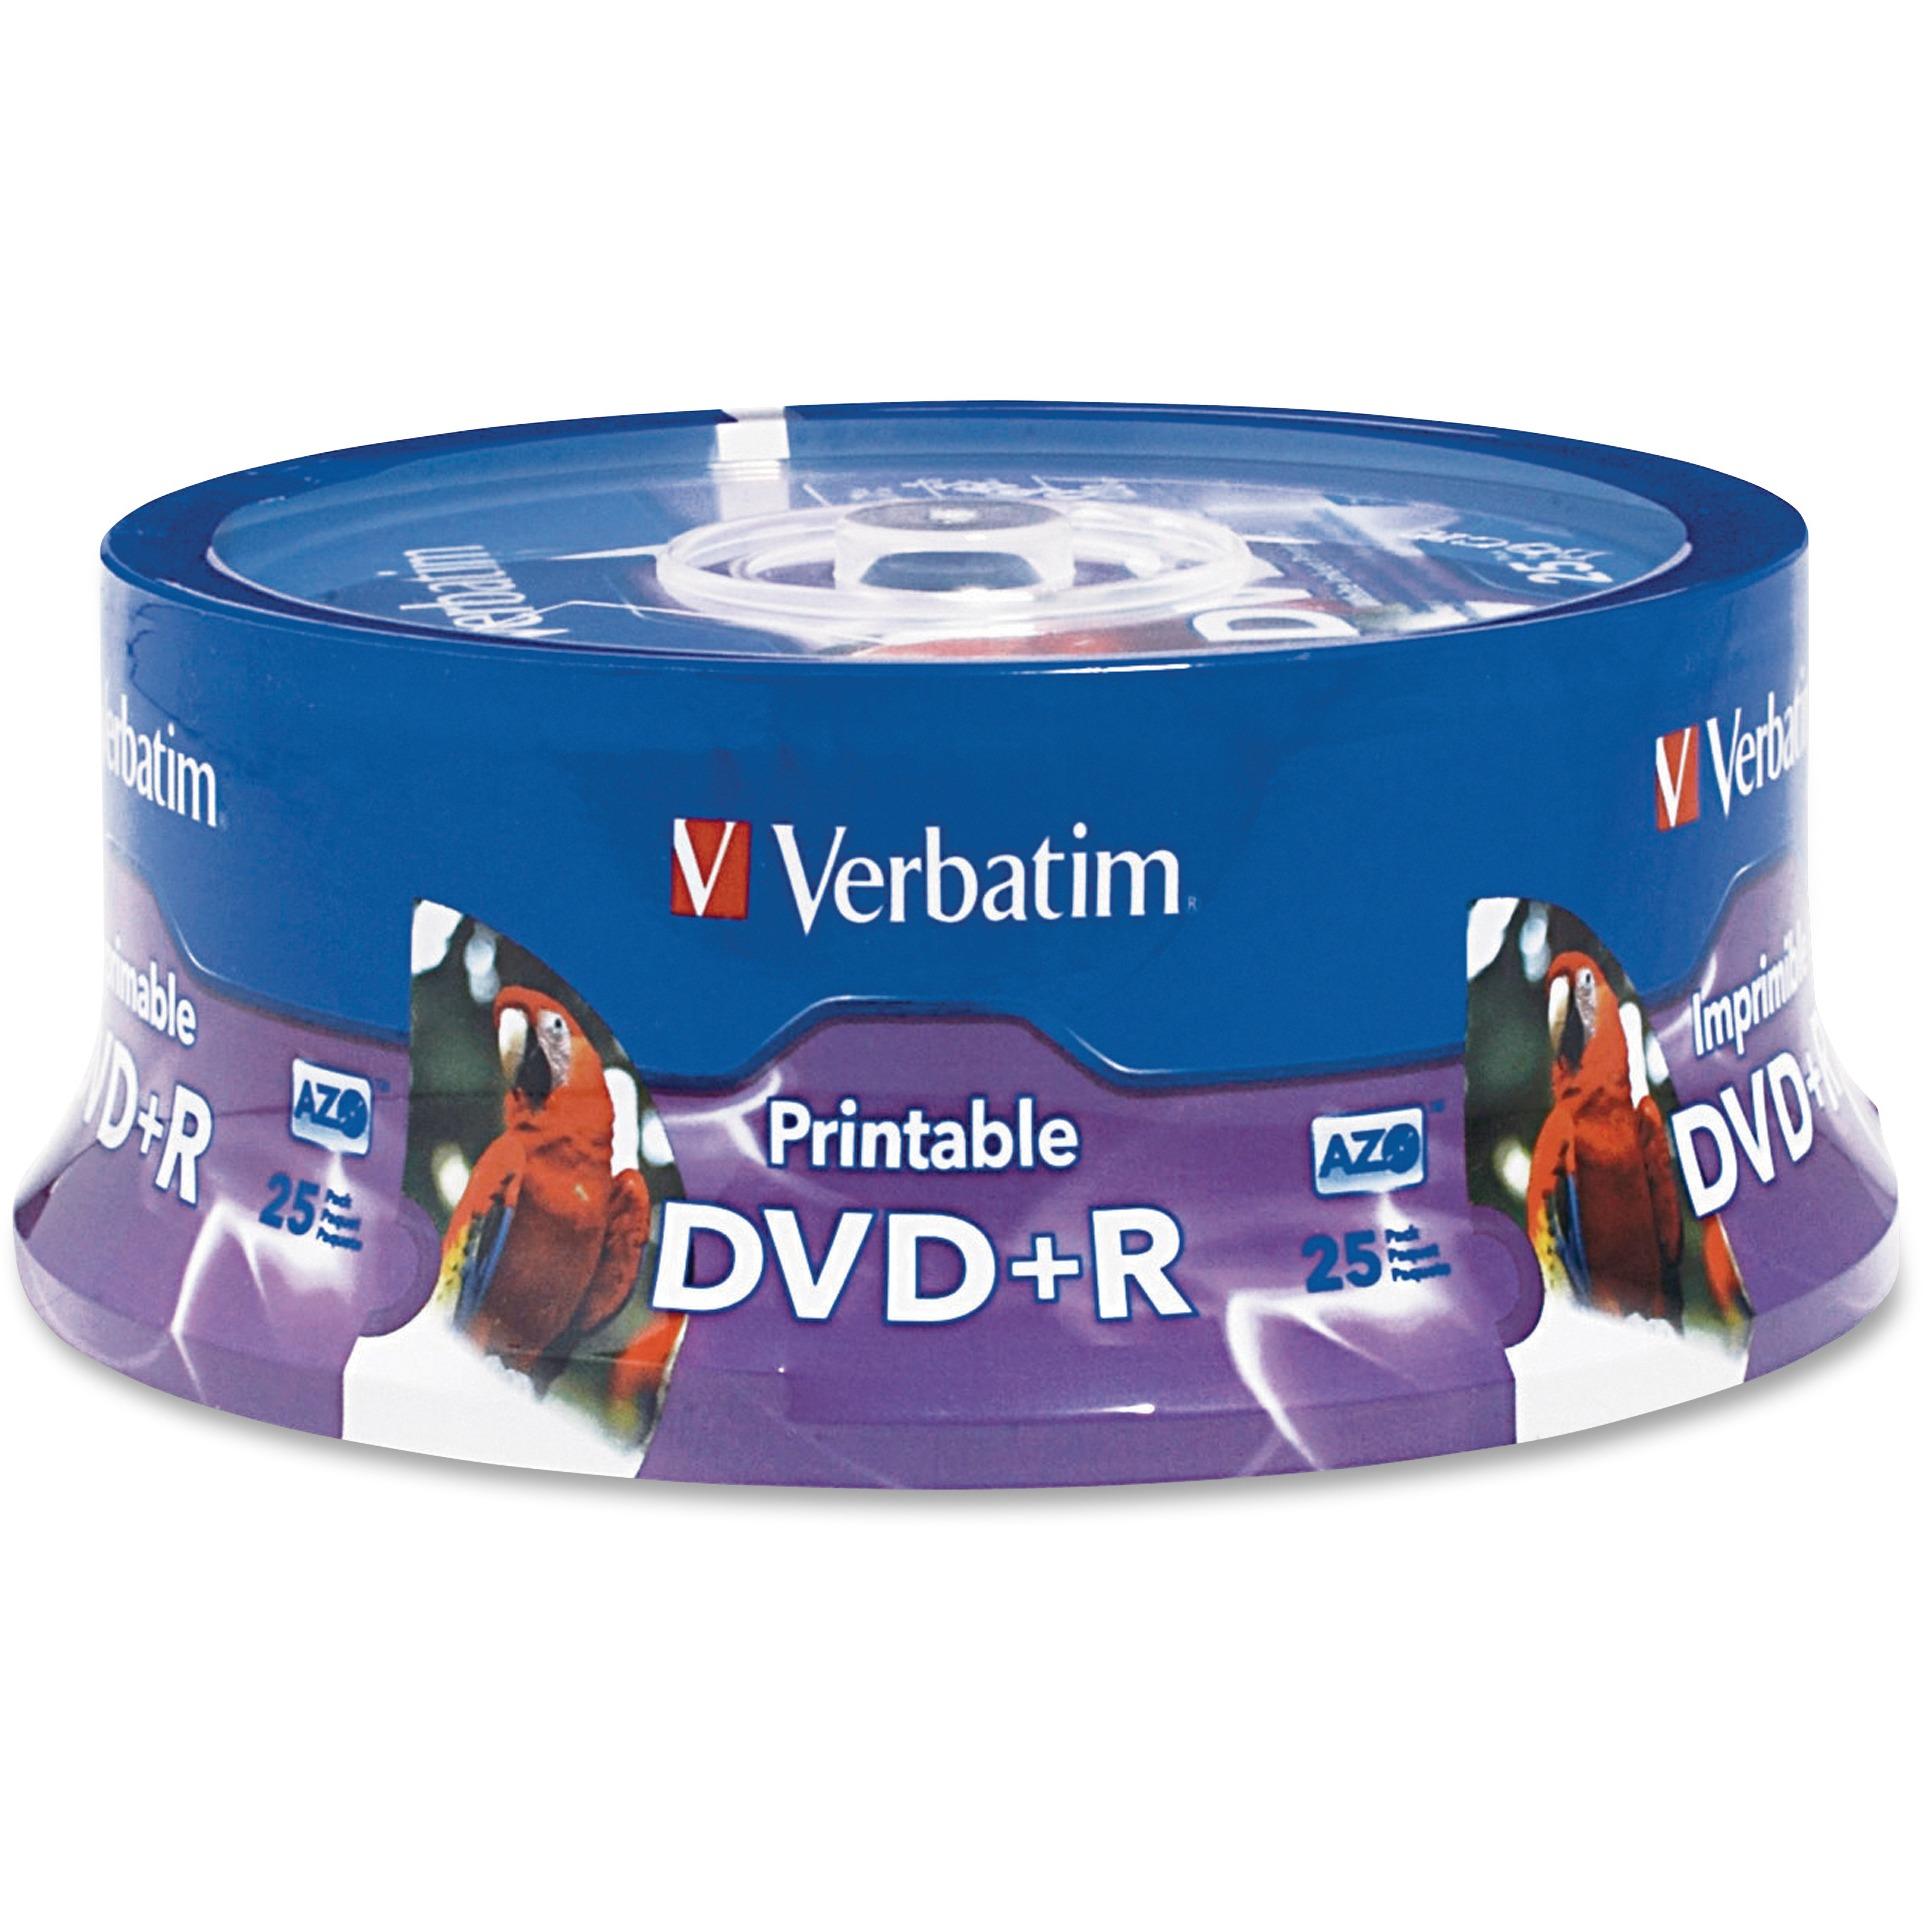 Verbatim, VER96190, 4.7GB Printable DVD+R Disks, 25, White